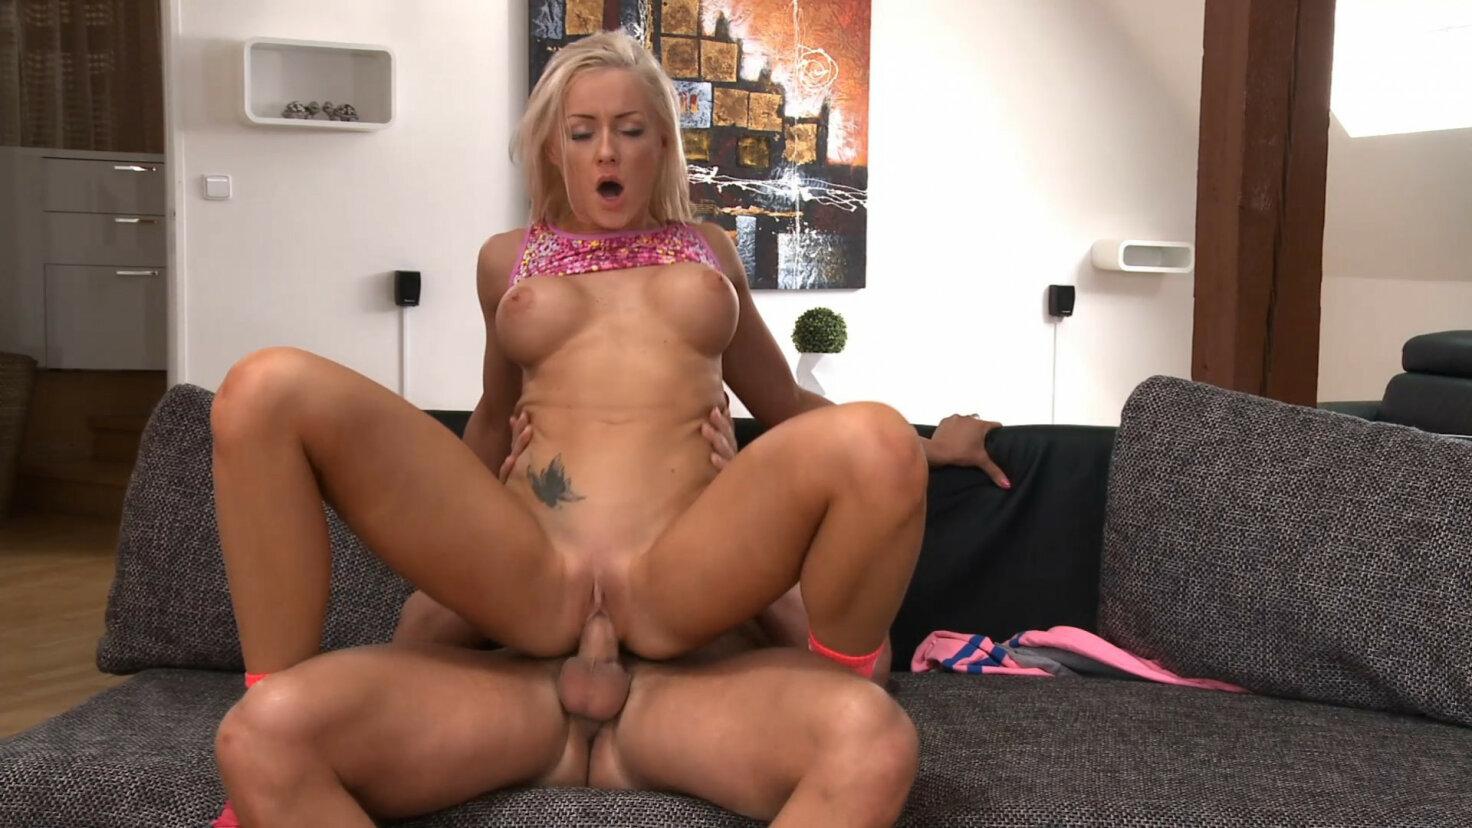 Big tits blonde sucks and rides cock hard